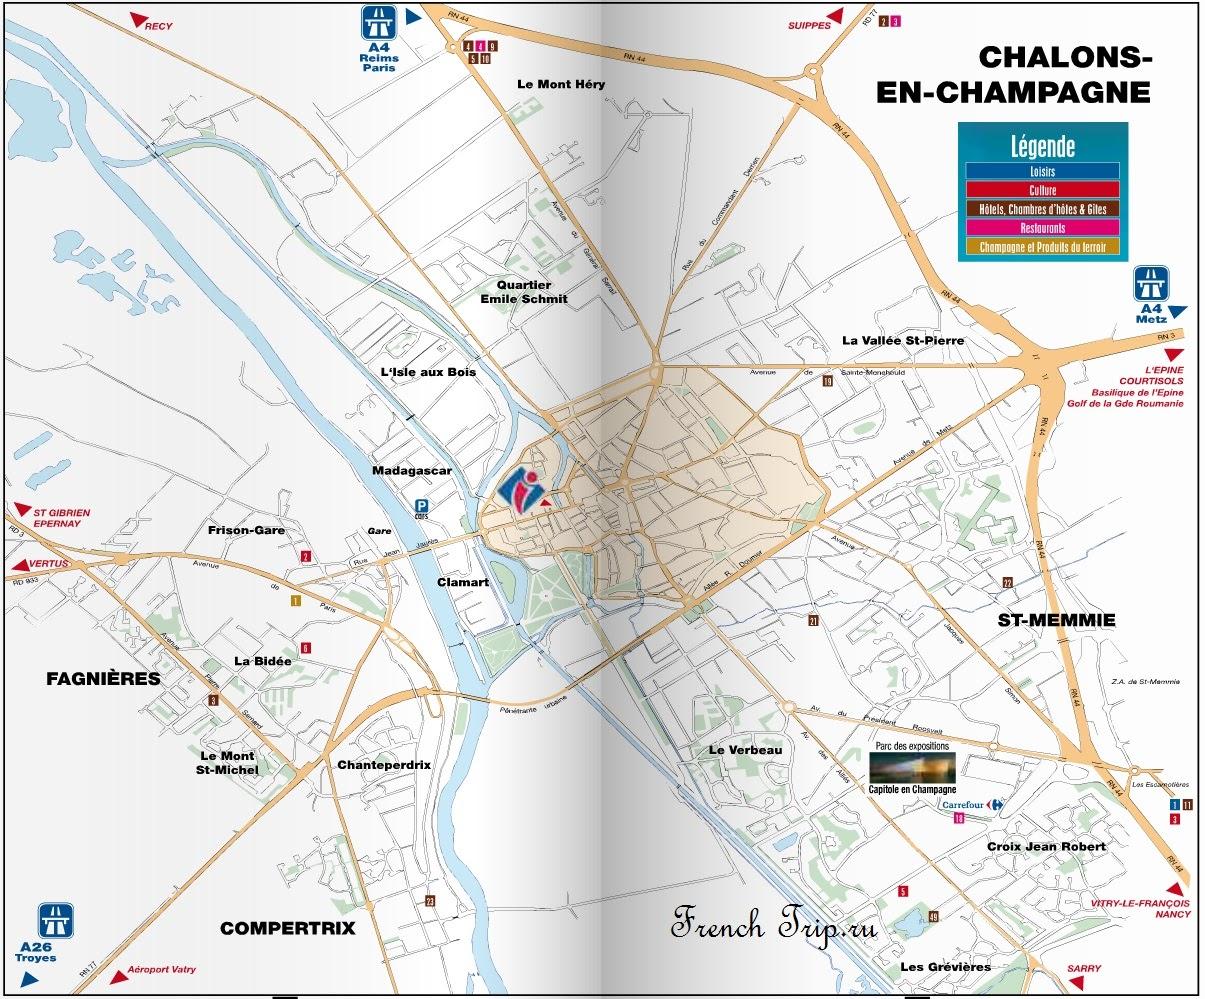 Карта Châlons-en-Champagne - Карта Шалон ан Шампани -  lons-en-Champagne Франция, Châlons-en-Champagne что посмотреть, Châlons-en-Champagne карта города, Châlons-en-Champagne достопримечательности на карте города, Карта Шалон ан Шампани - карта с отмеченными достопримечательностями, путеводитель по Шалон ан Шампани, путеводитель по региону Шампань и Франции